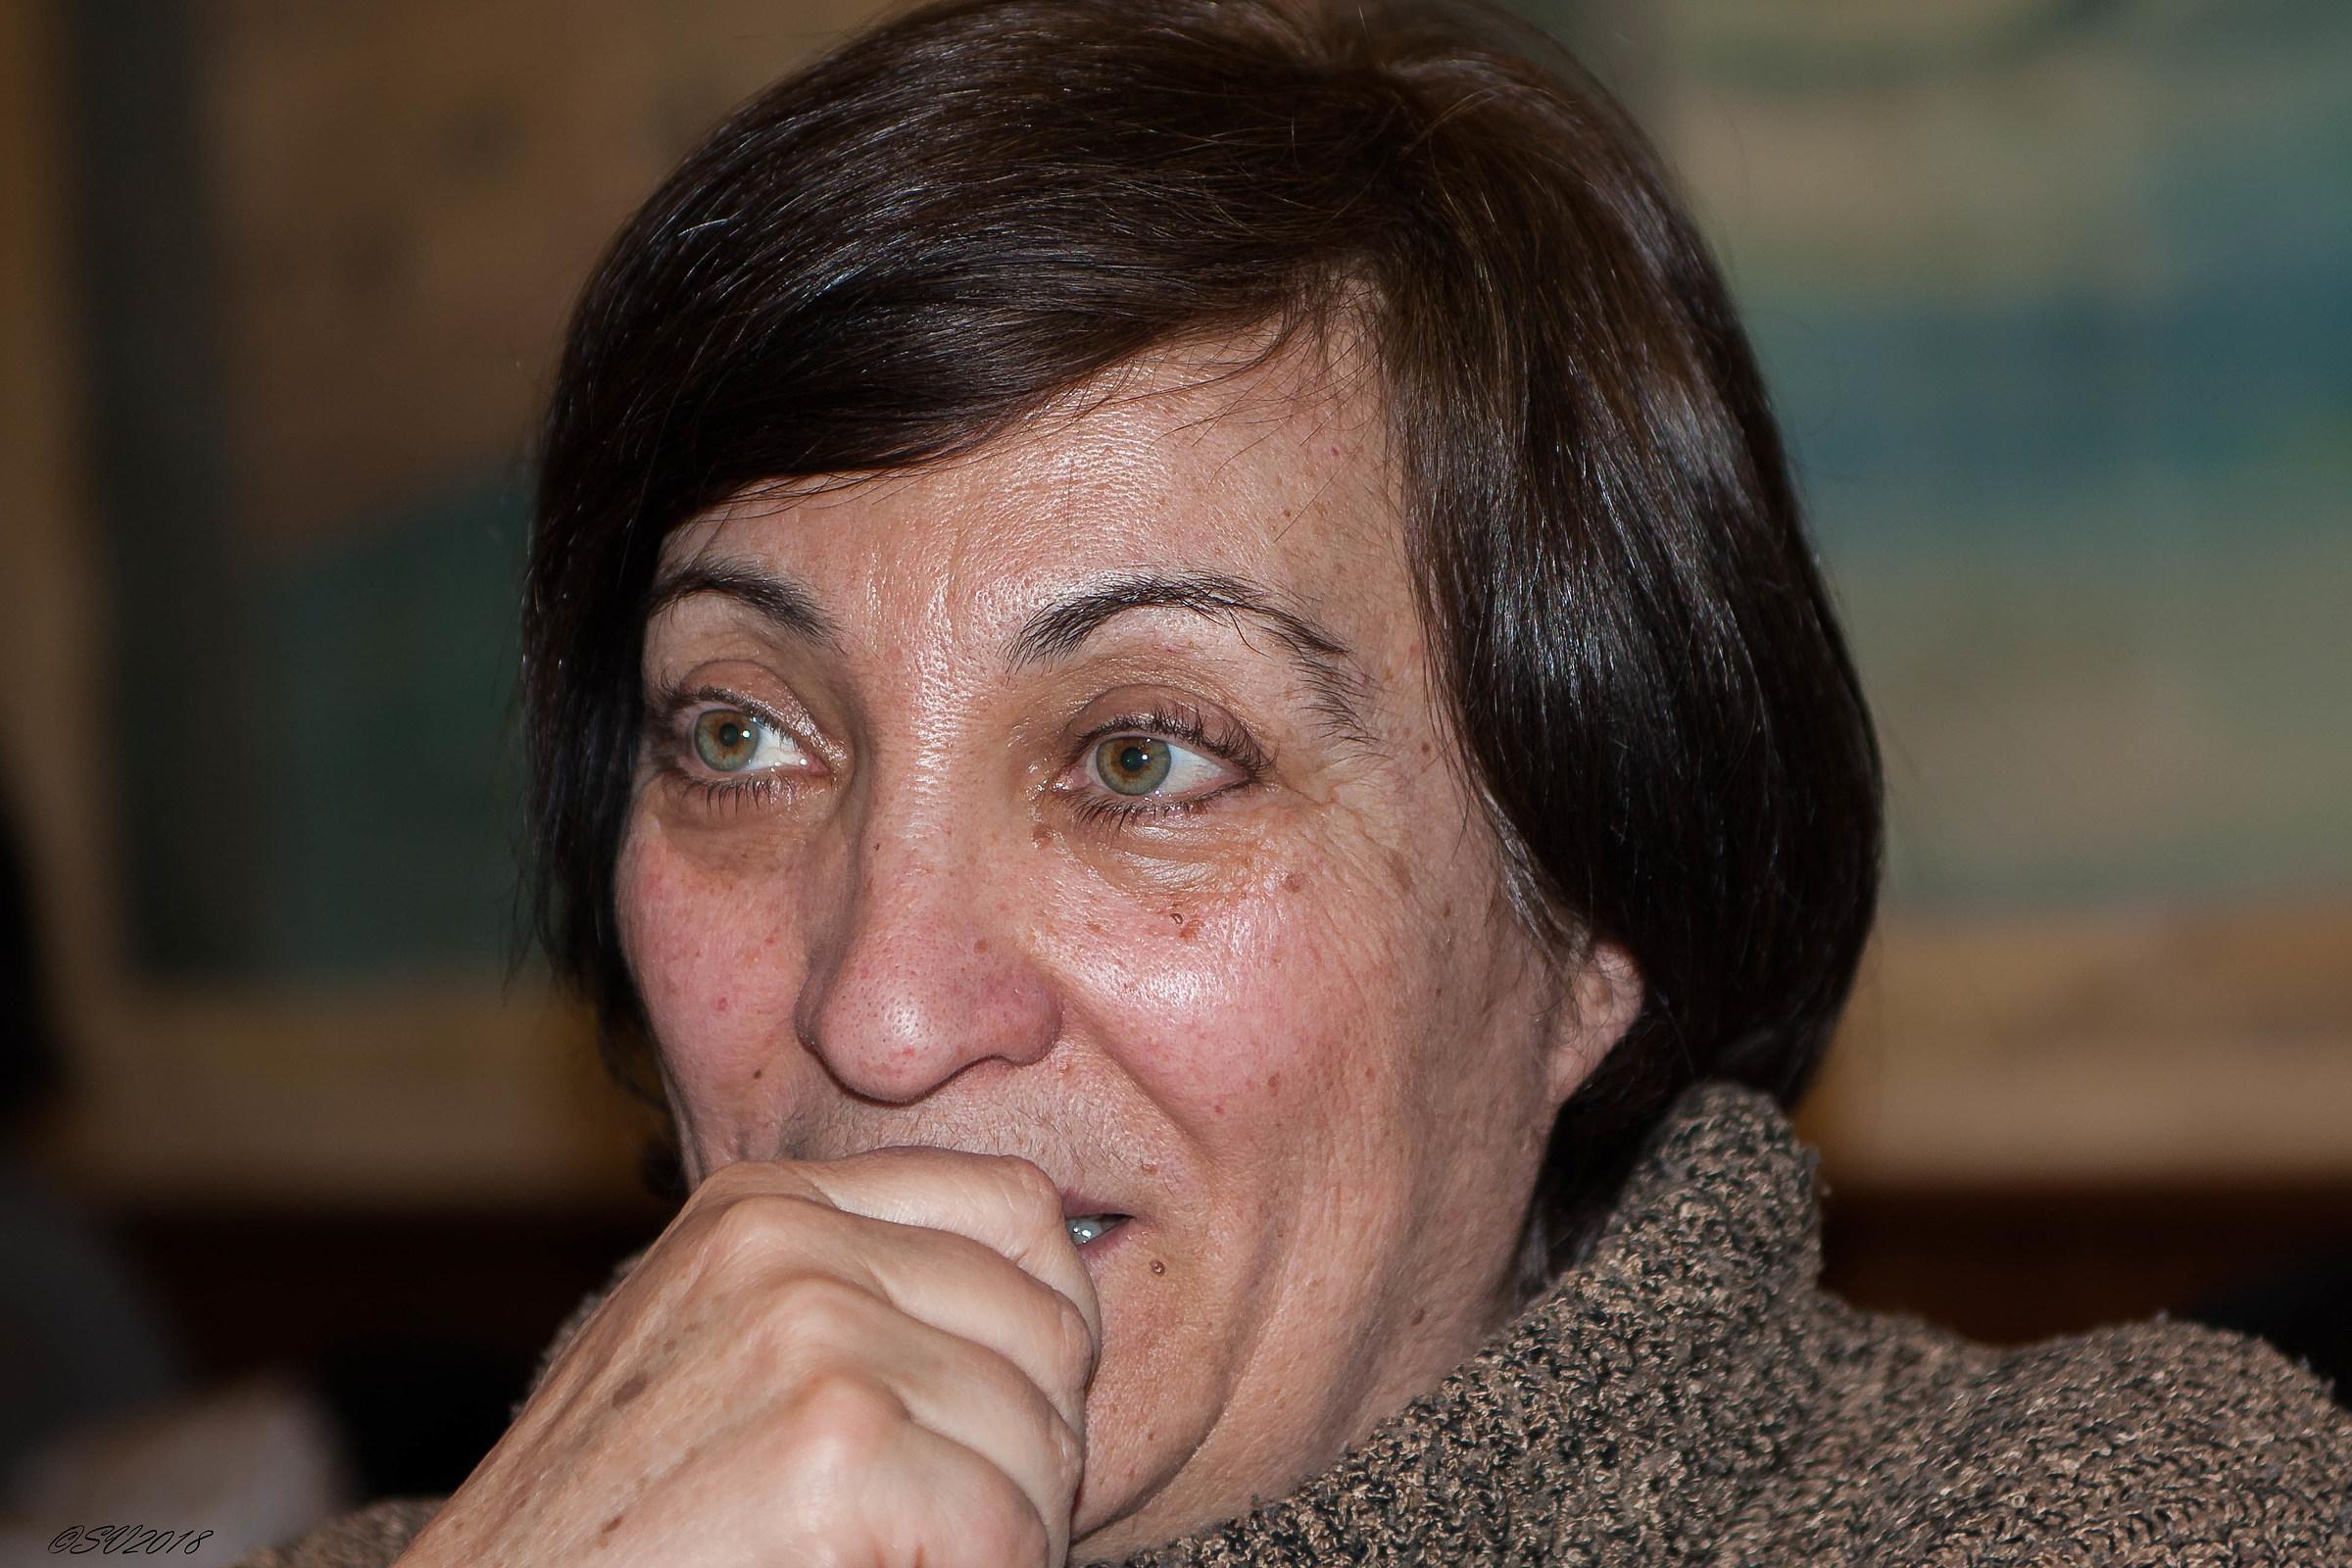 Pia moglie di Mauriziol...